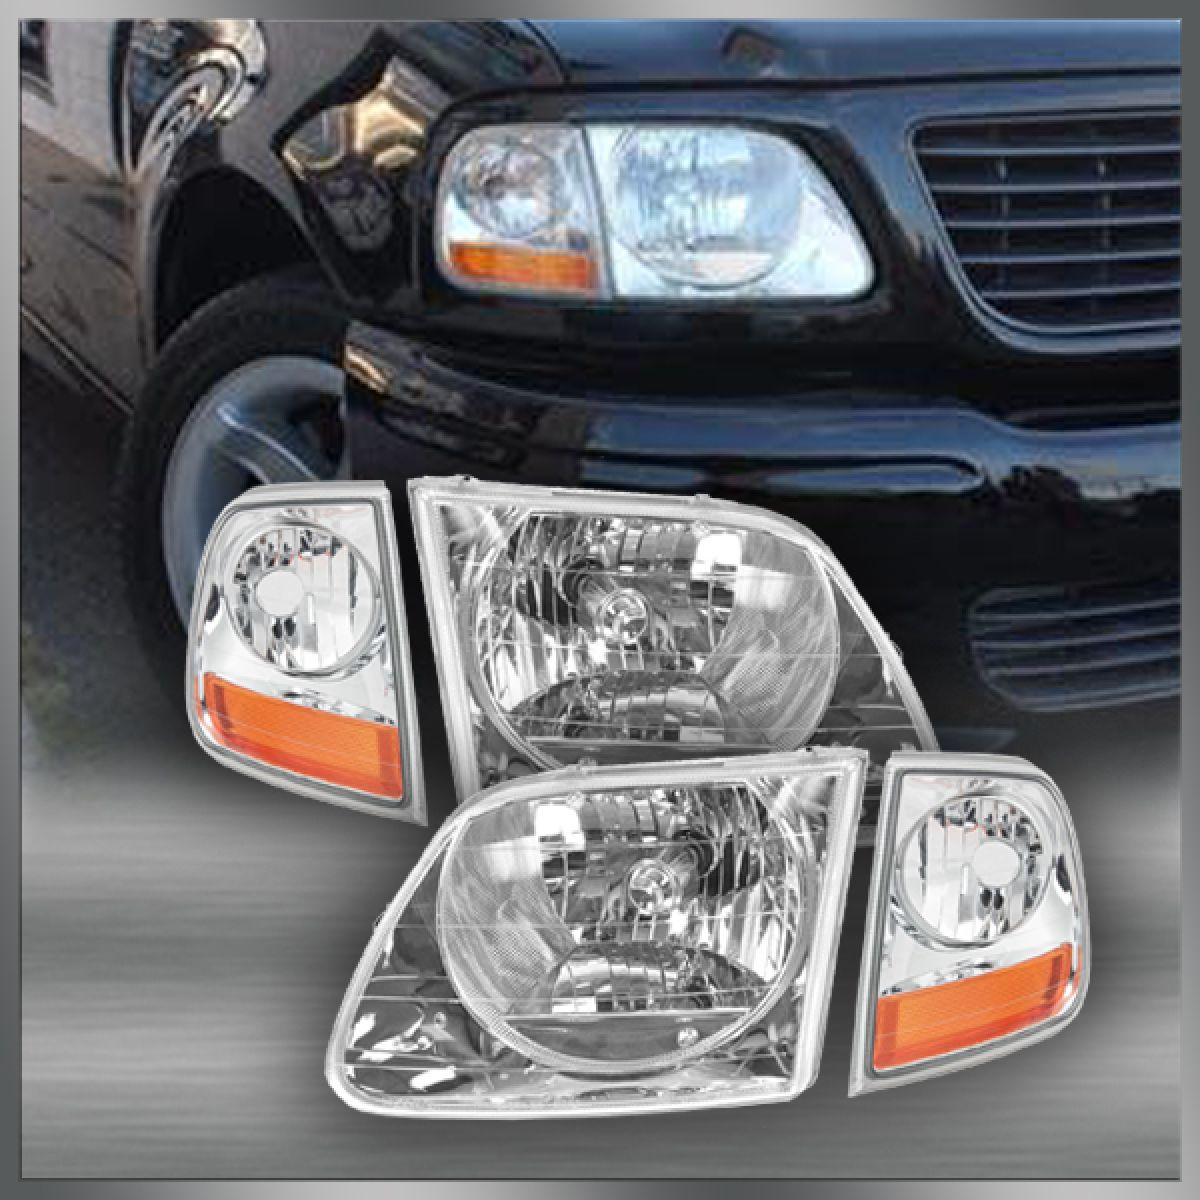 Brilliant Lightning Style Headlights Corner Parking Lights Kit Set For F150 Wiring Cloud Ostrrenstrafr09Org